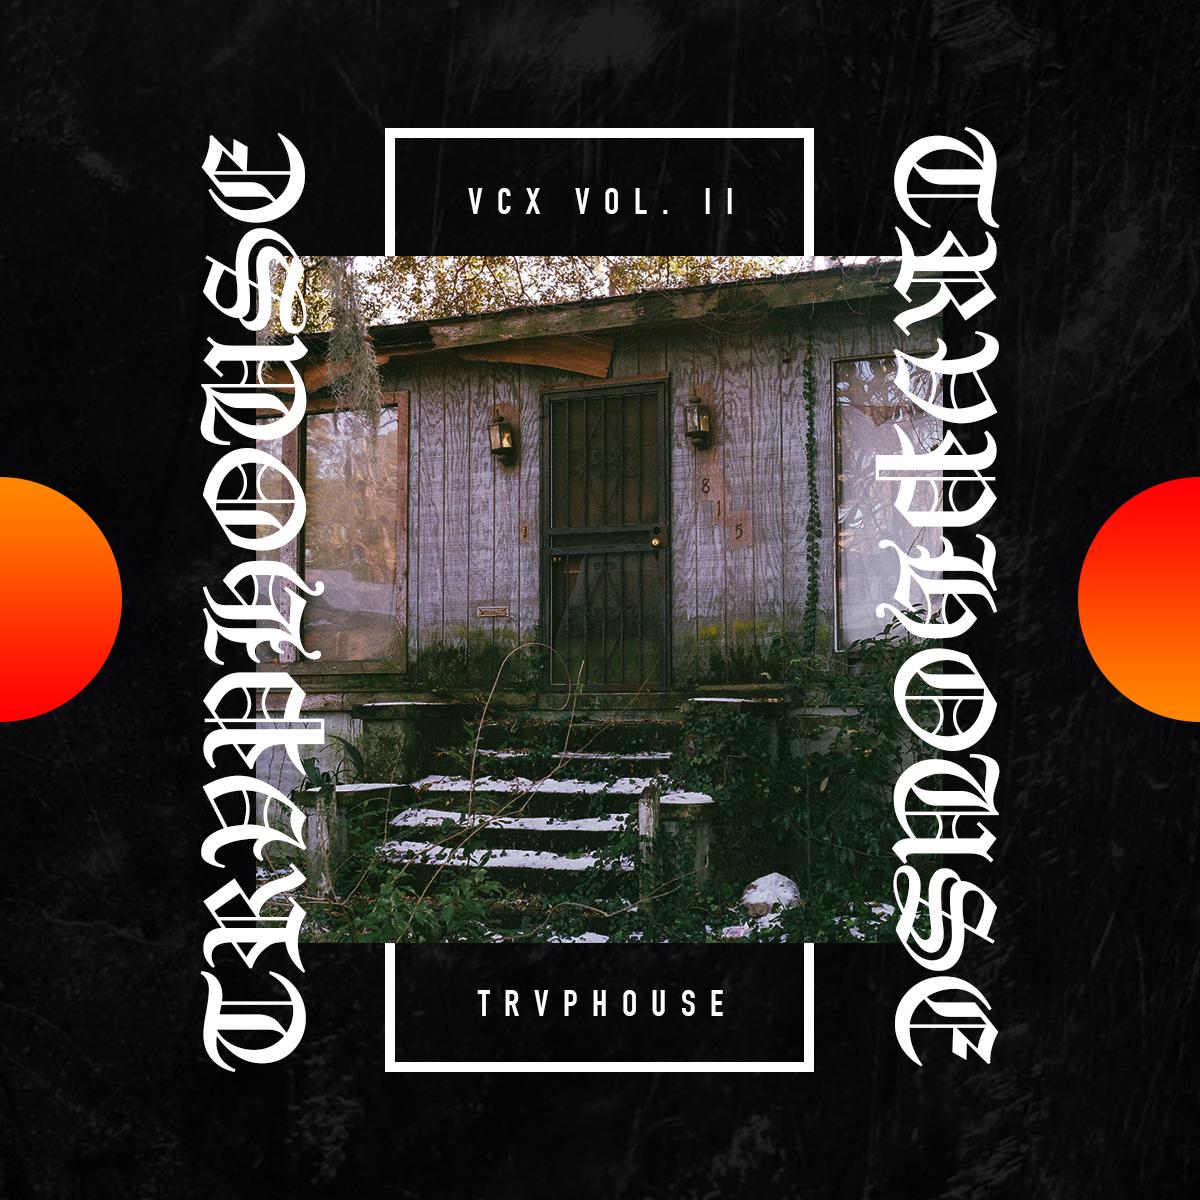 VCX Vol. II: TRVPHOUSE (Cover Art)